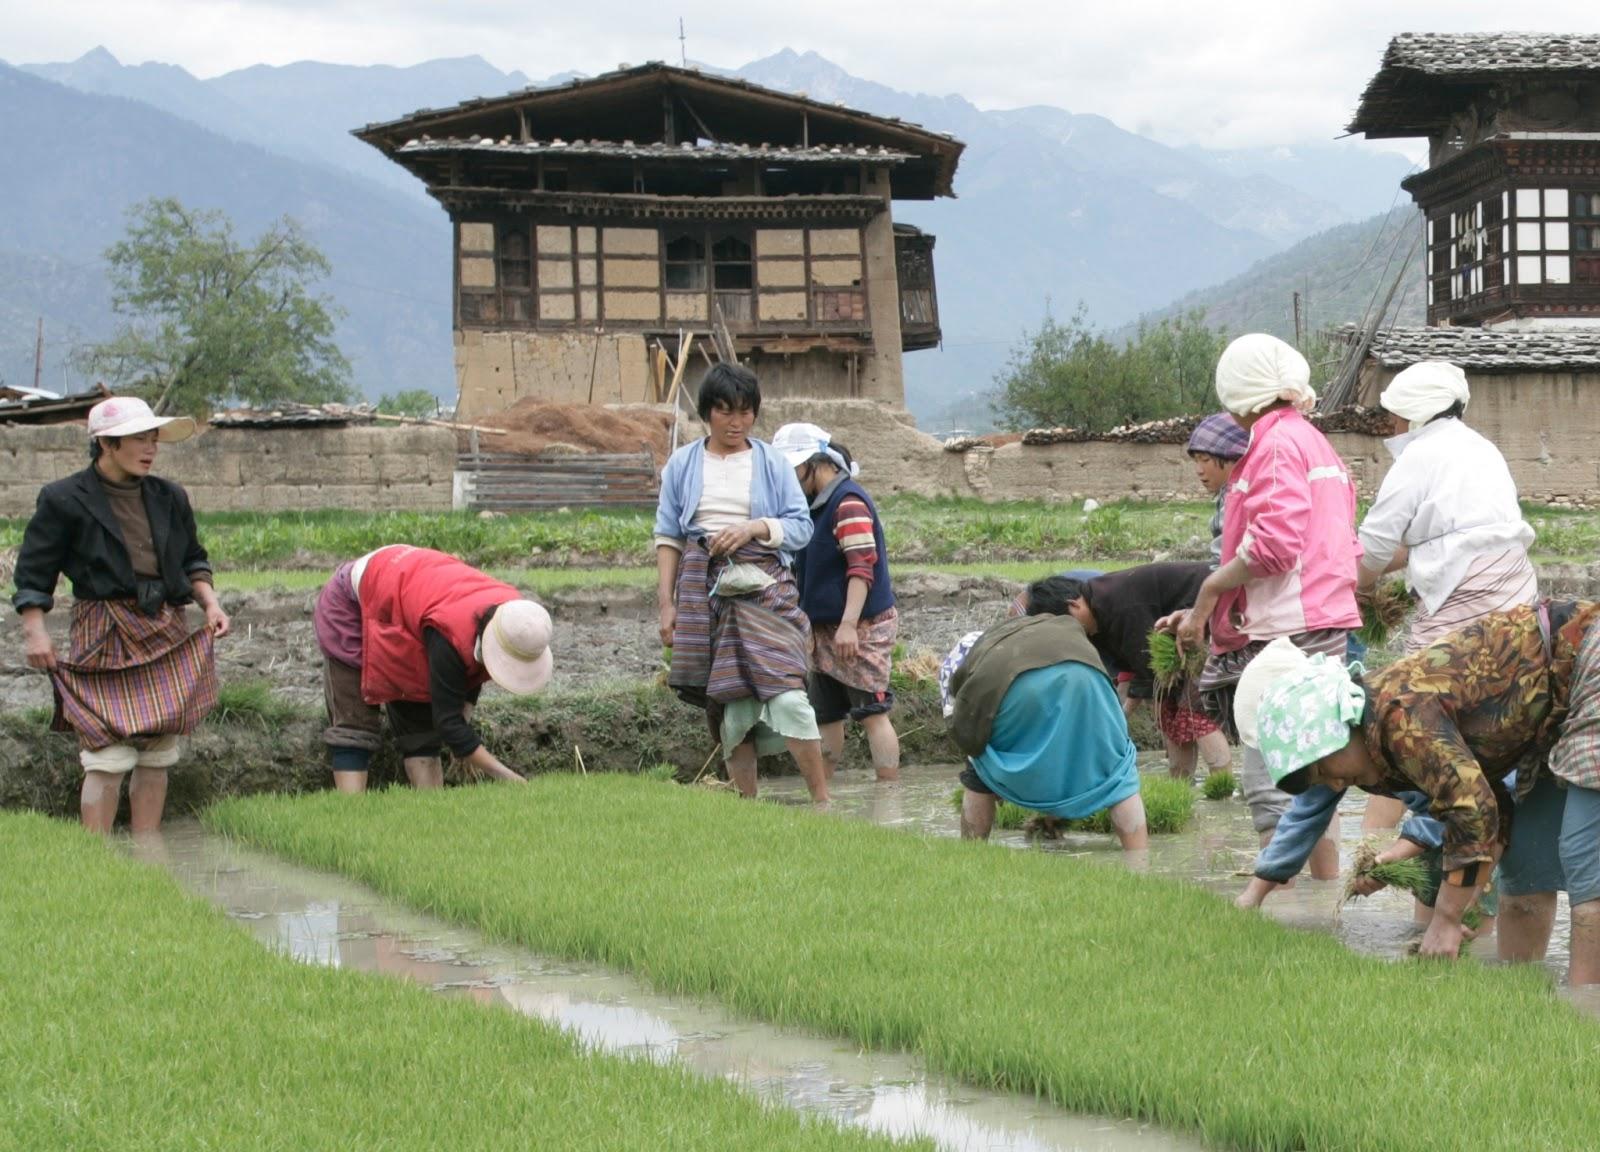 People Of Bhutan Bhutanese Where Is BHUTAN - Where is bhutan